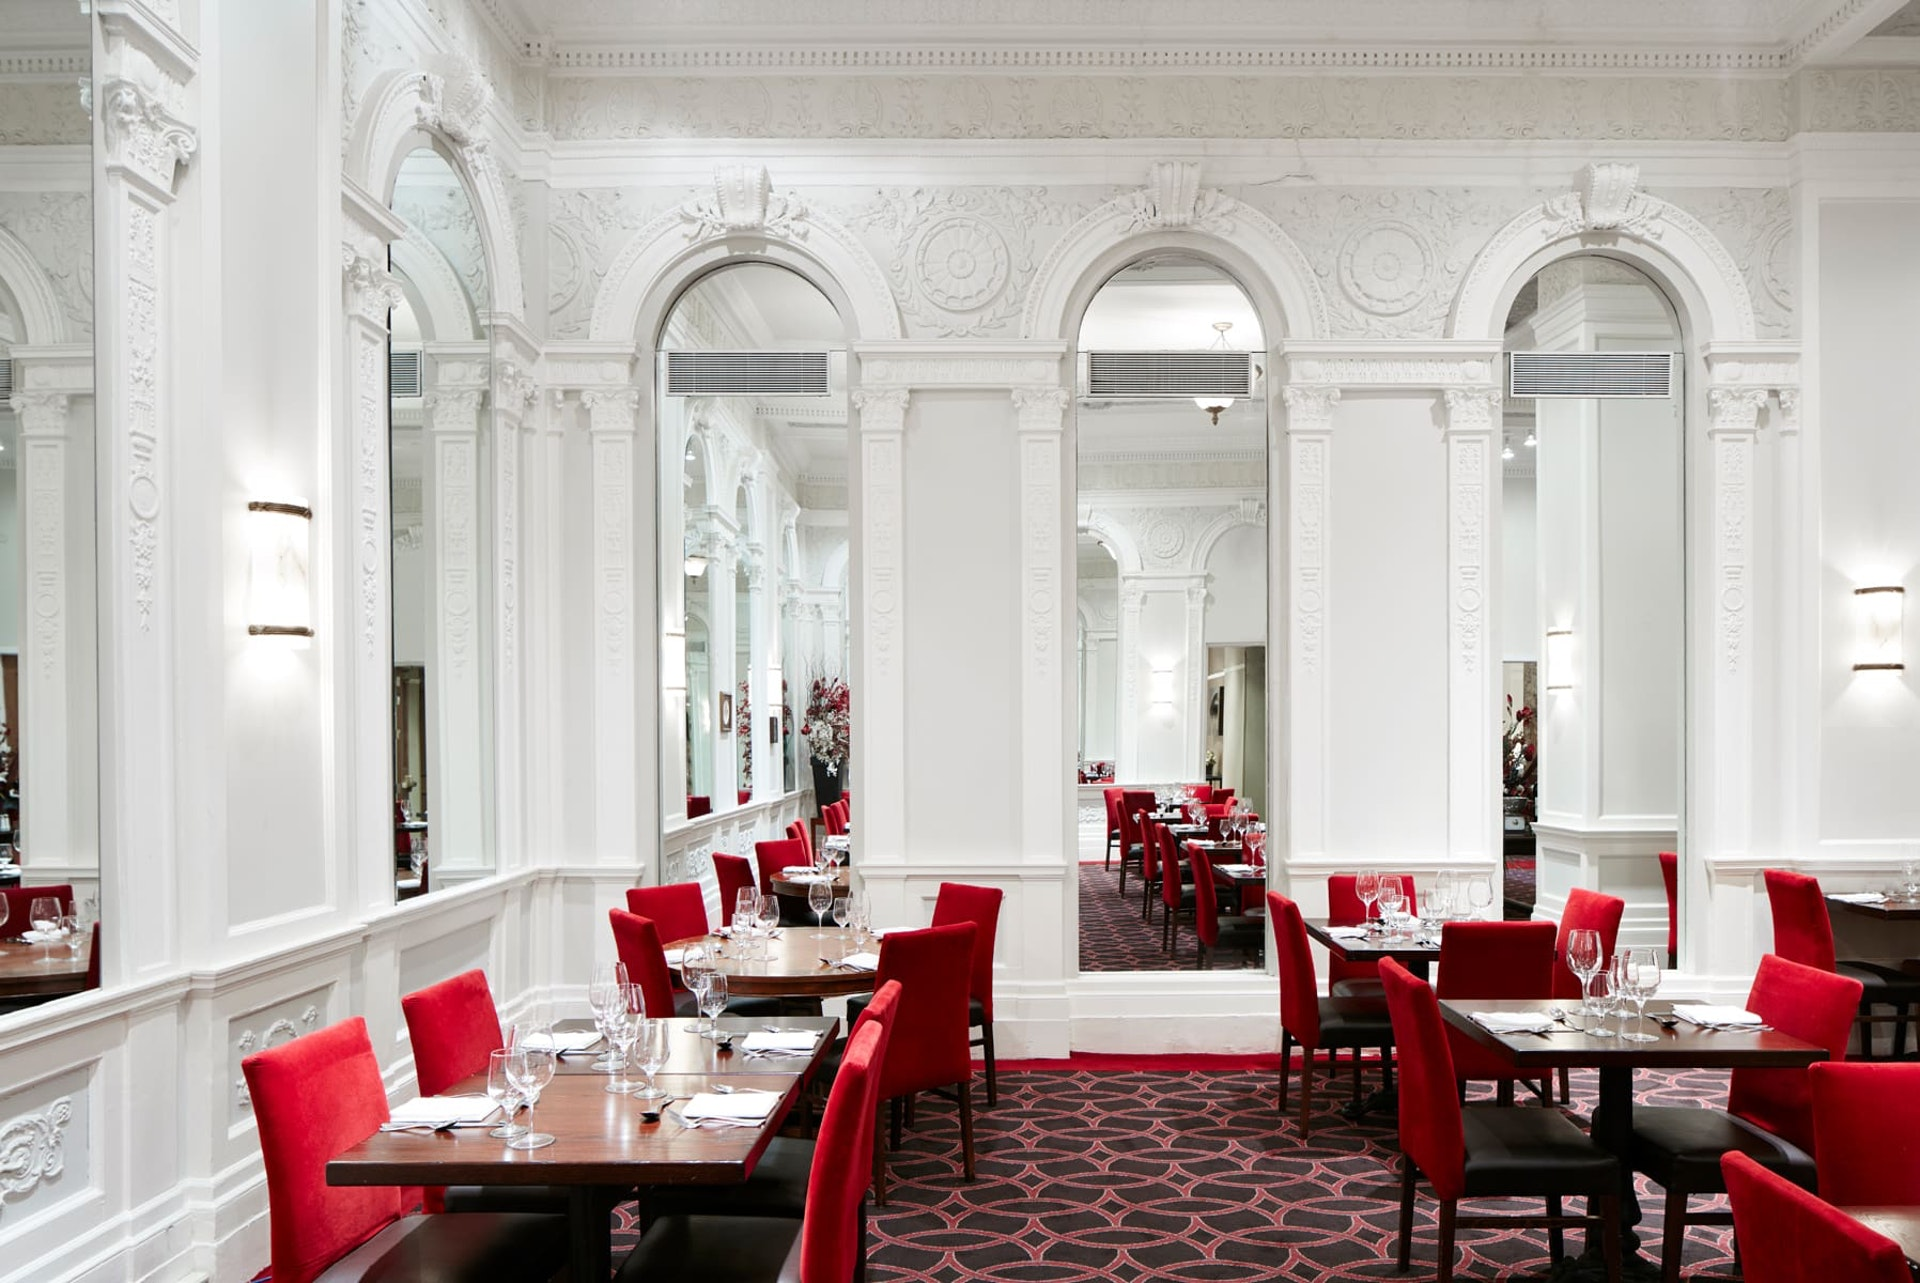 Interior of Patrick Restaurant, New York